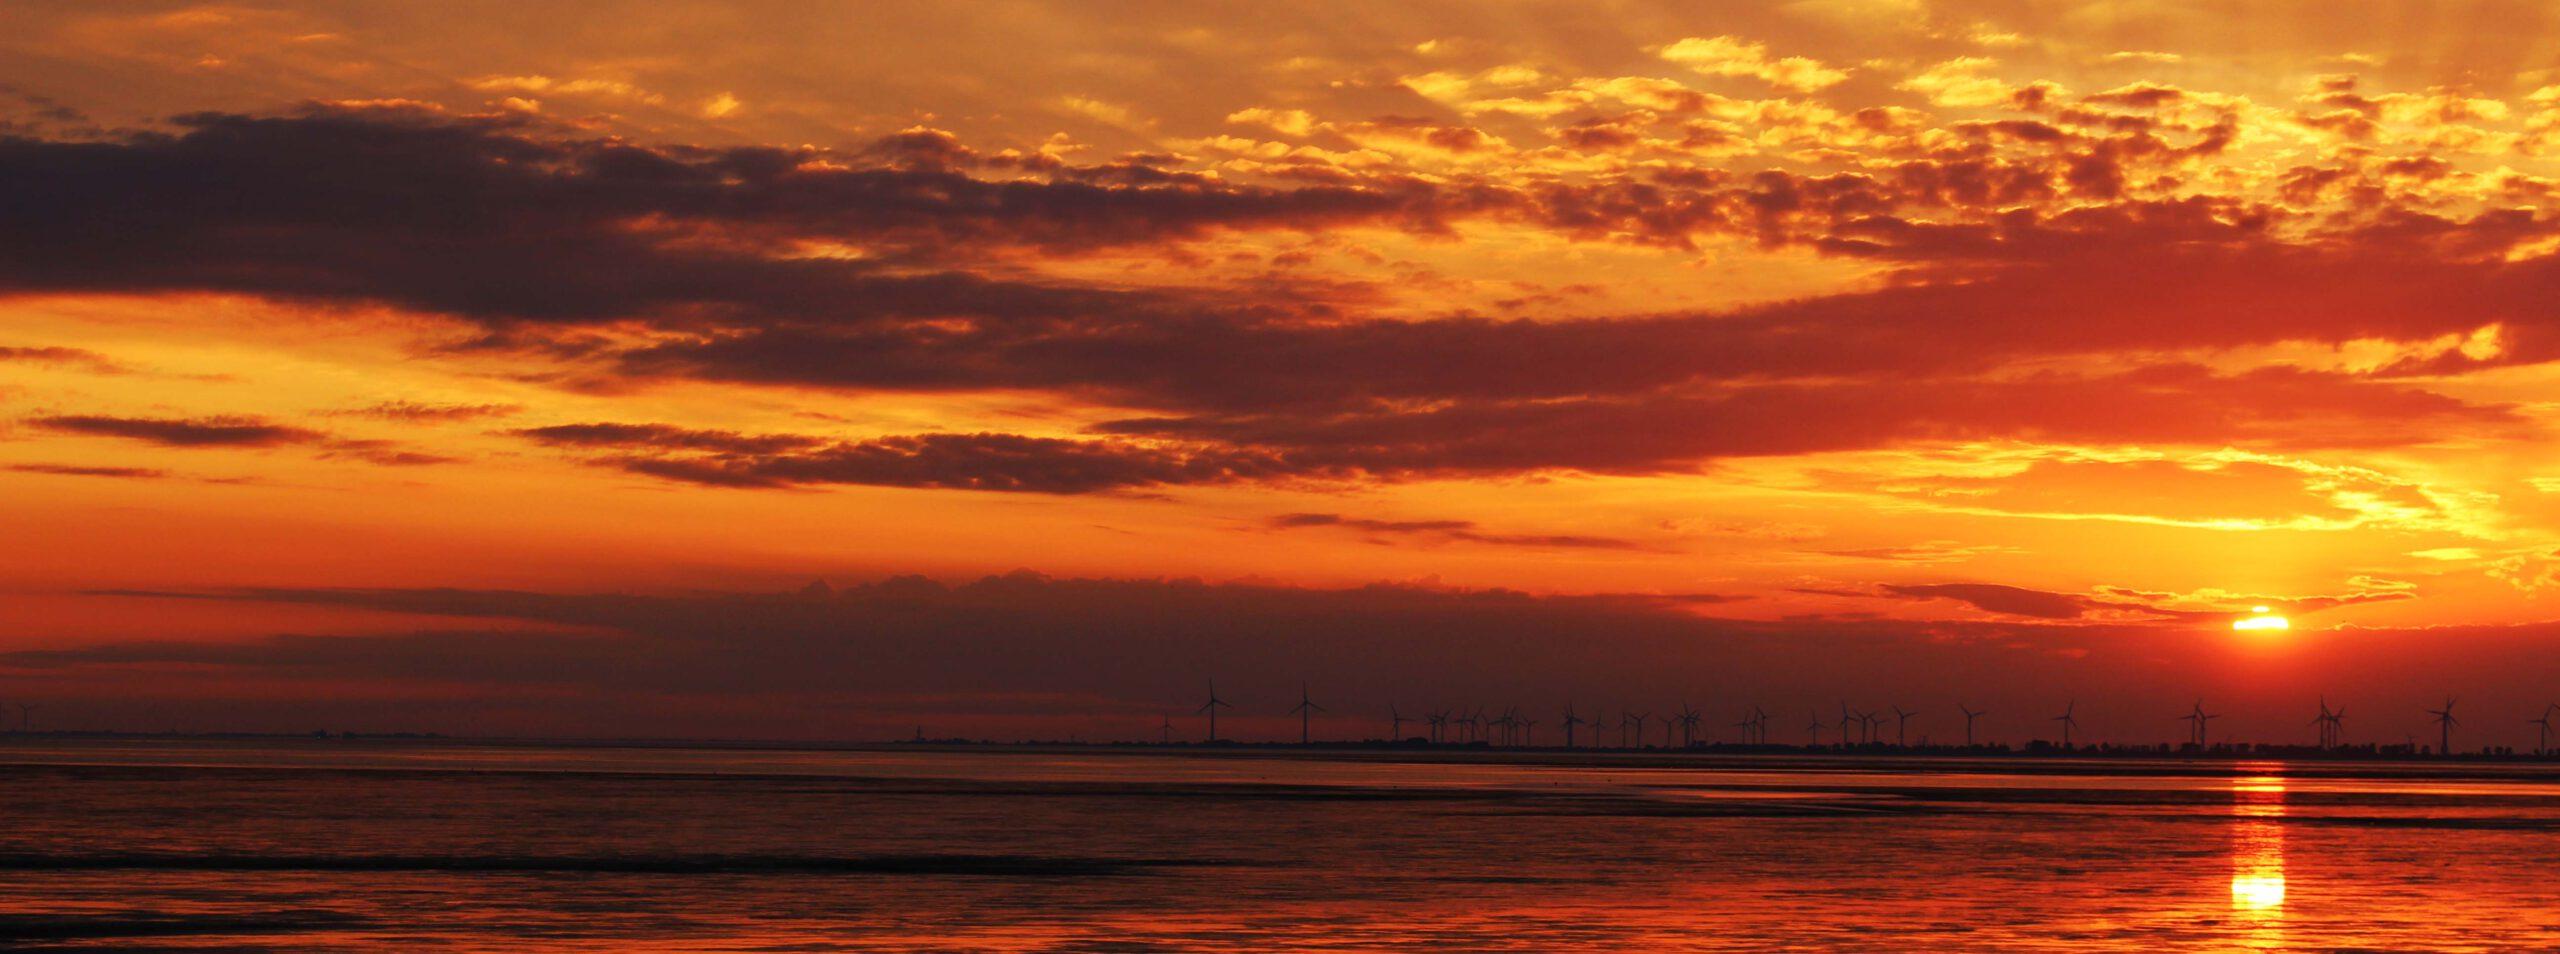 Sonnenuntergang an der Bohrinsel | Dyksterhusen